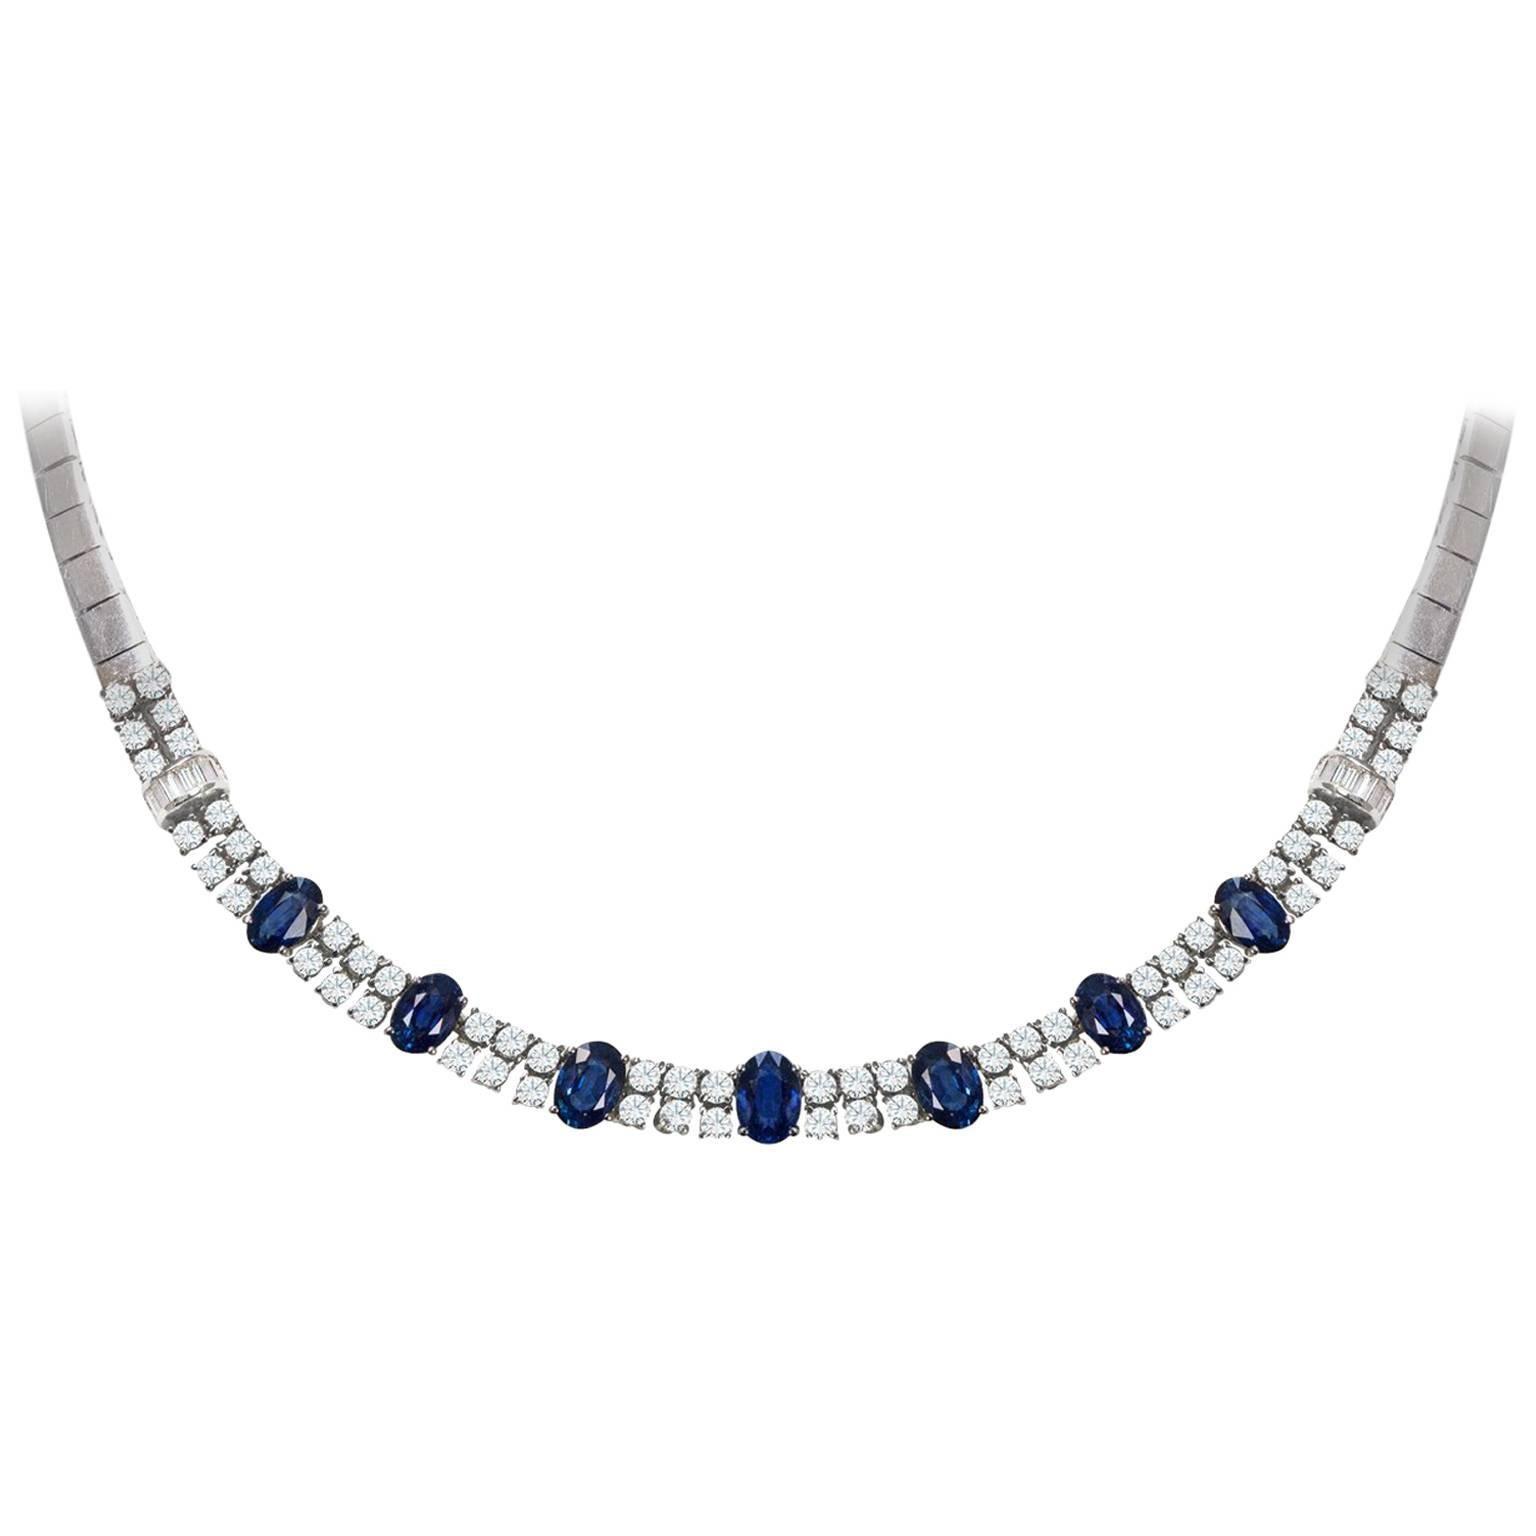 Roman Malakov, Oval Cut Sapphire Diamond Necklace